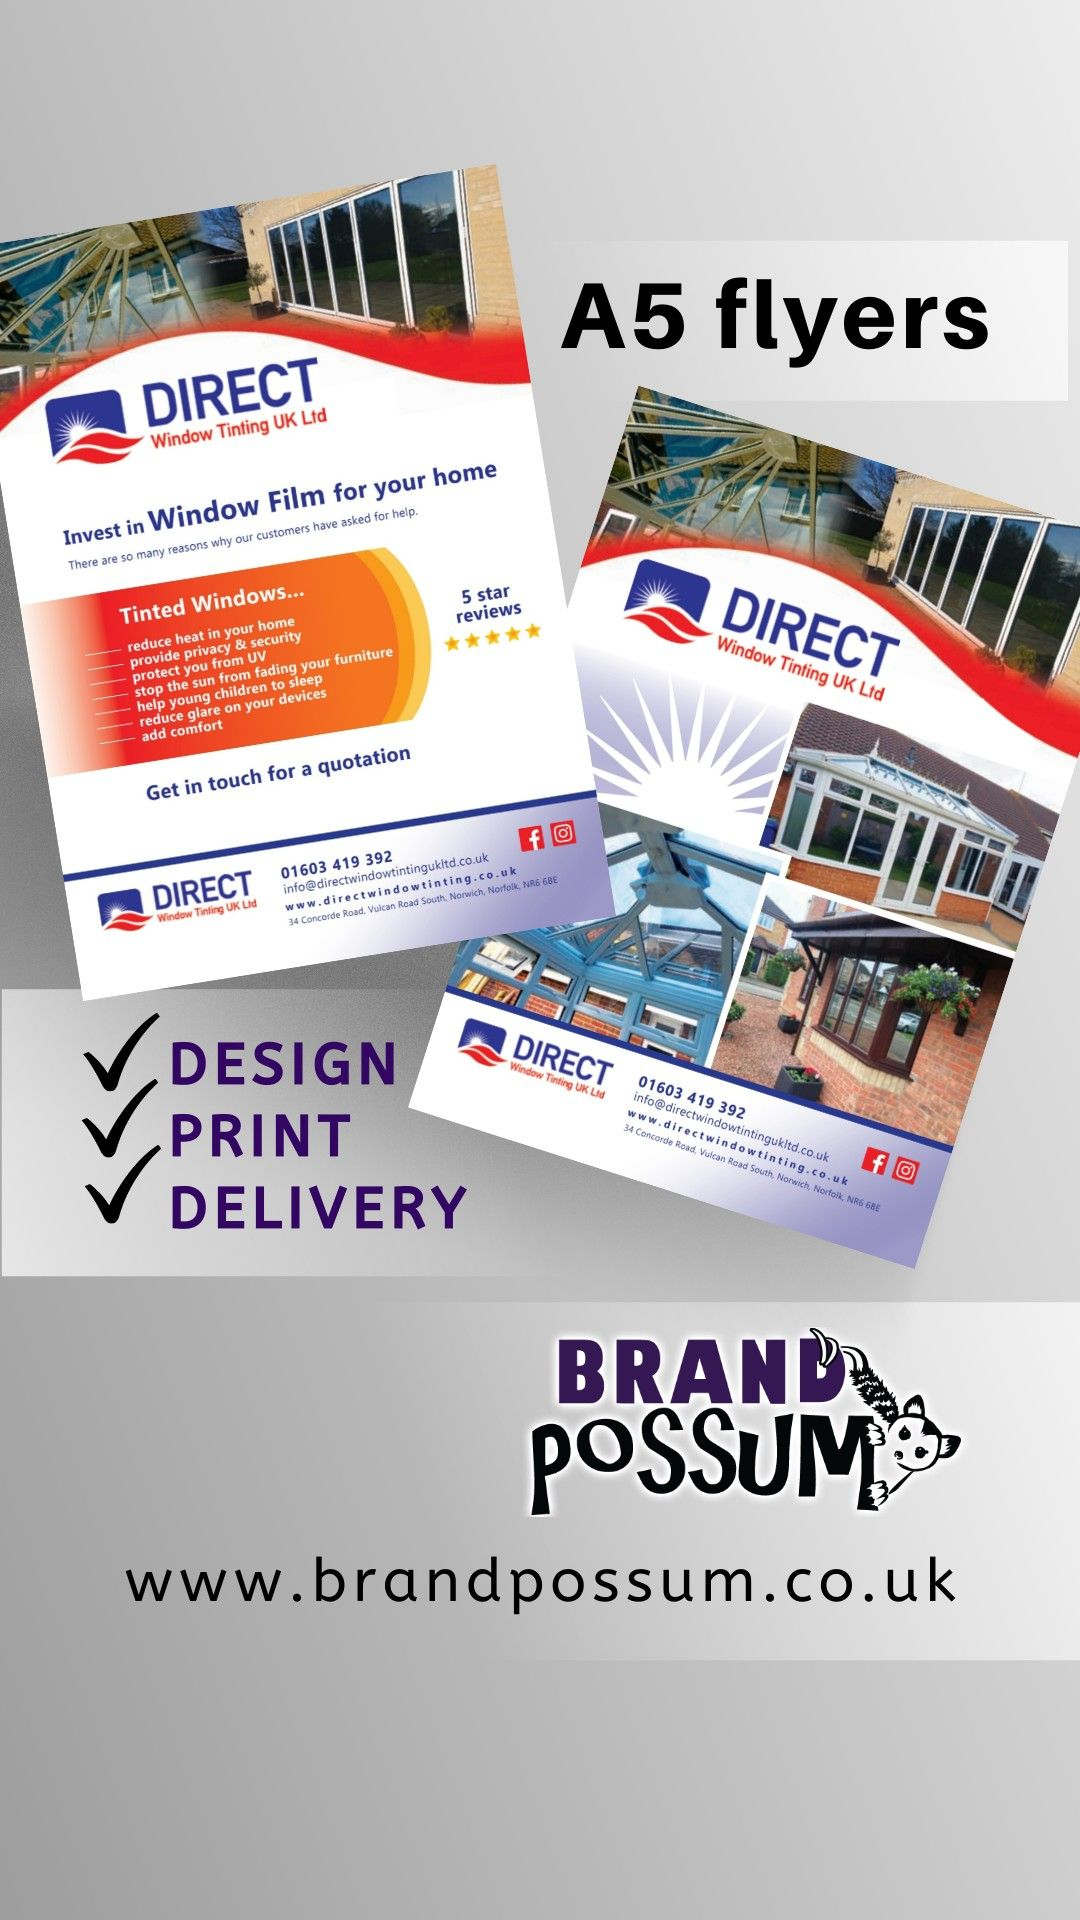 Brand Possum Flyers Design Print Delivery Graphic Design Portfolio Print Graphic Design Services Flyer